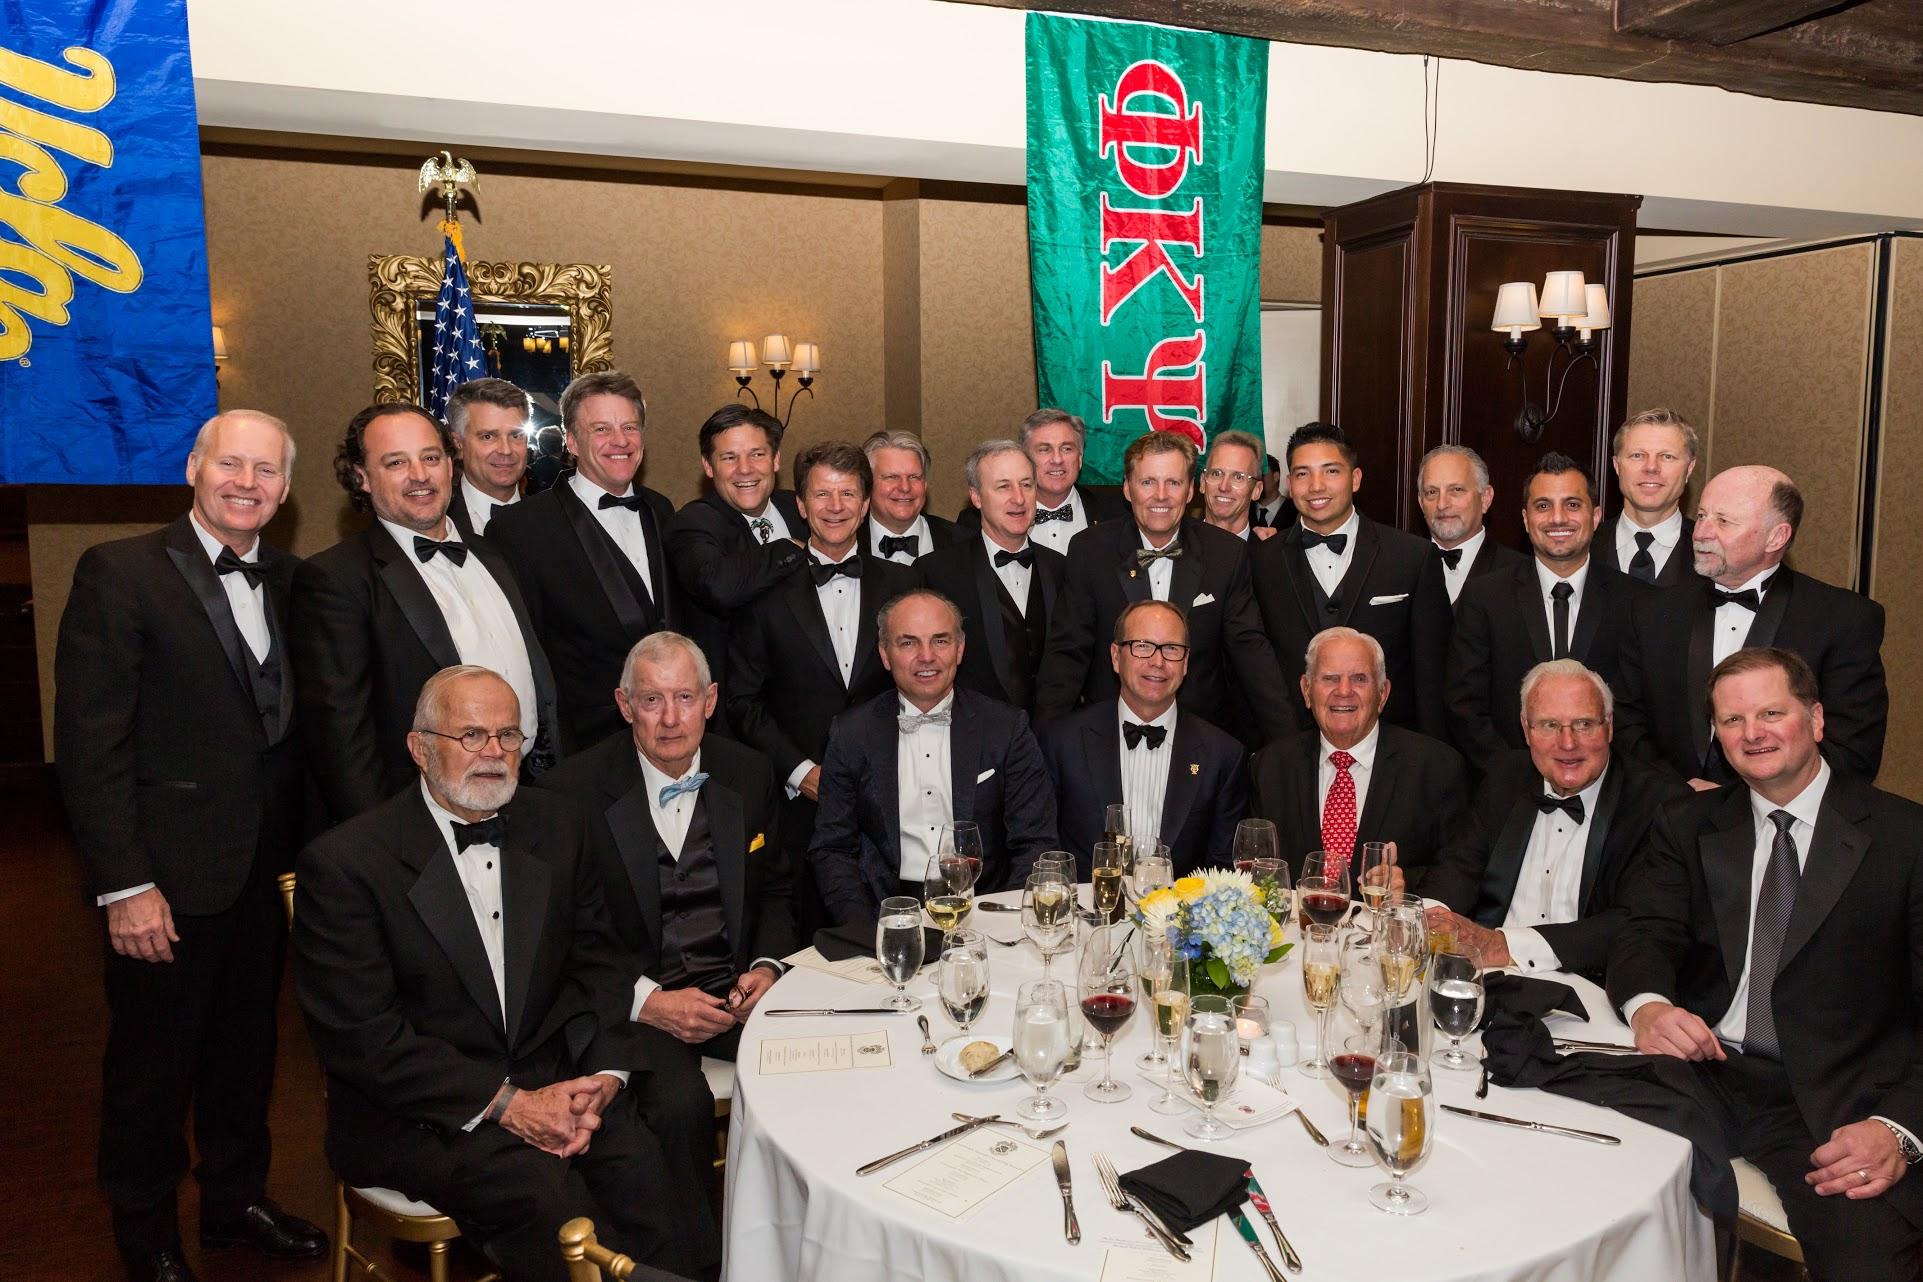 Chartering Banquet (Jan 30th, 2016)